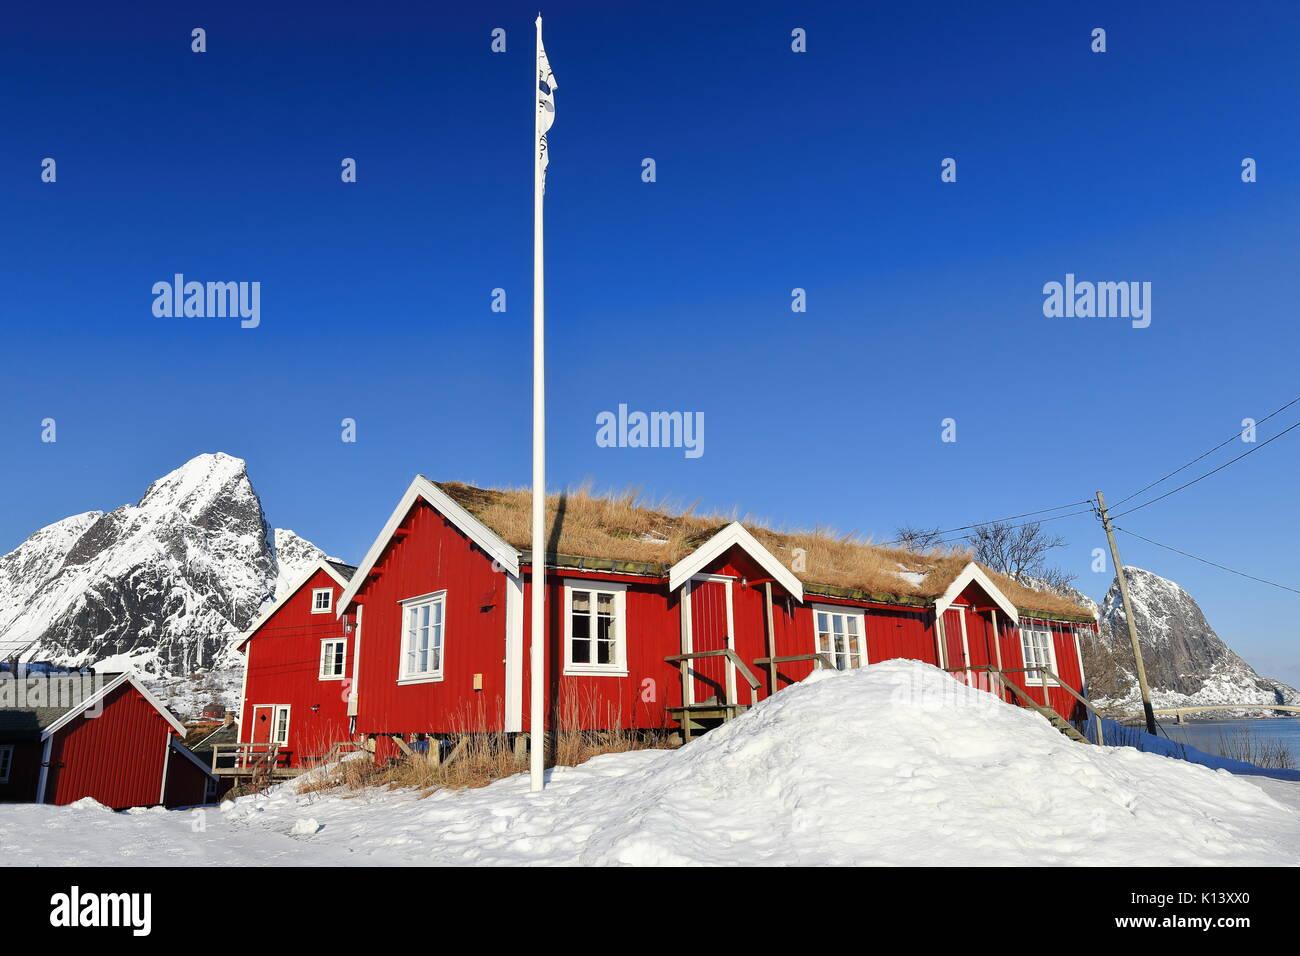 Red wooden cottages or rorbuer-once traditional seasonal fishing huts-now for tourist use-Reine village. Rostadtinden-Olstinden-Festhaeltinden mounts  - Stock Image